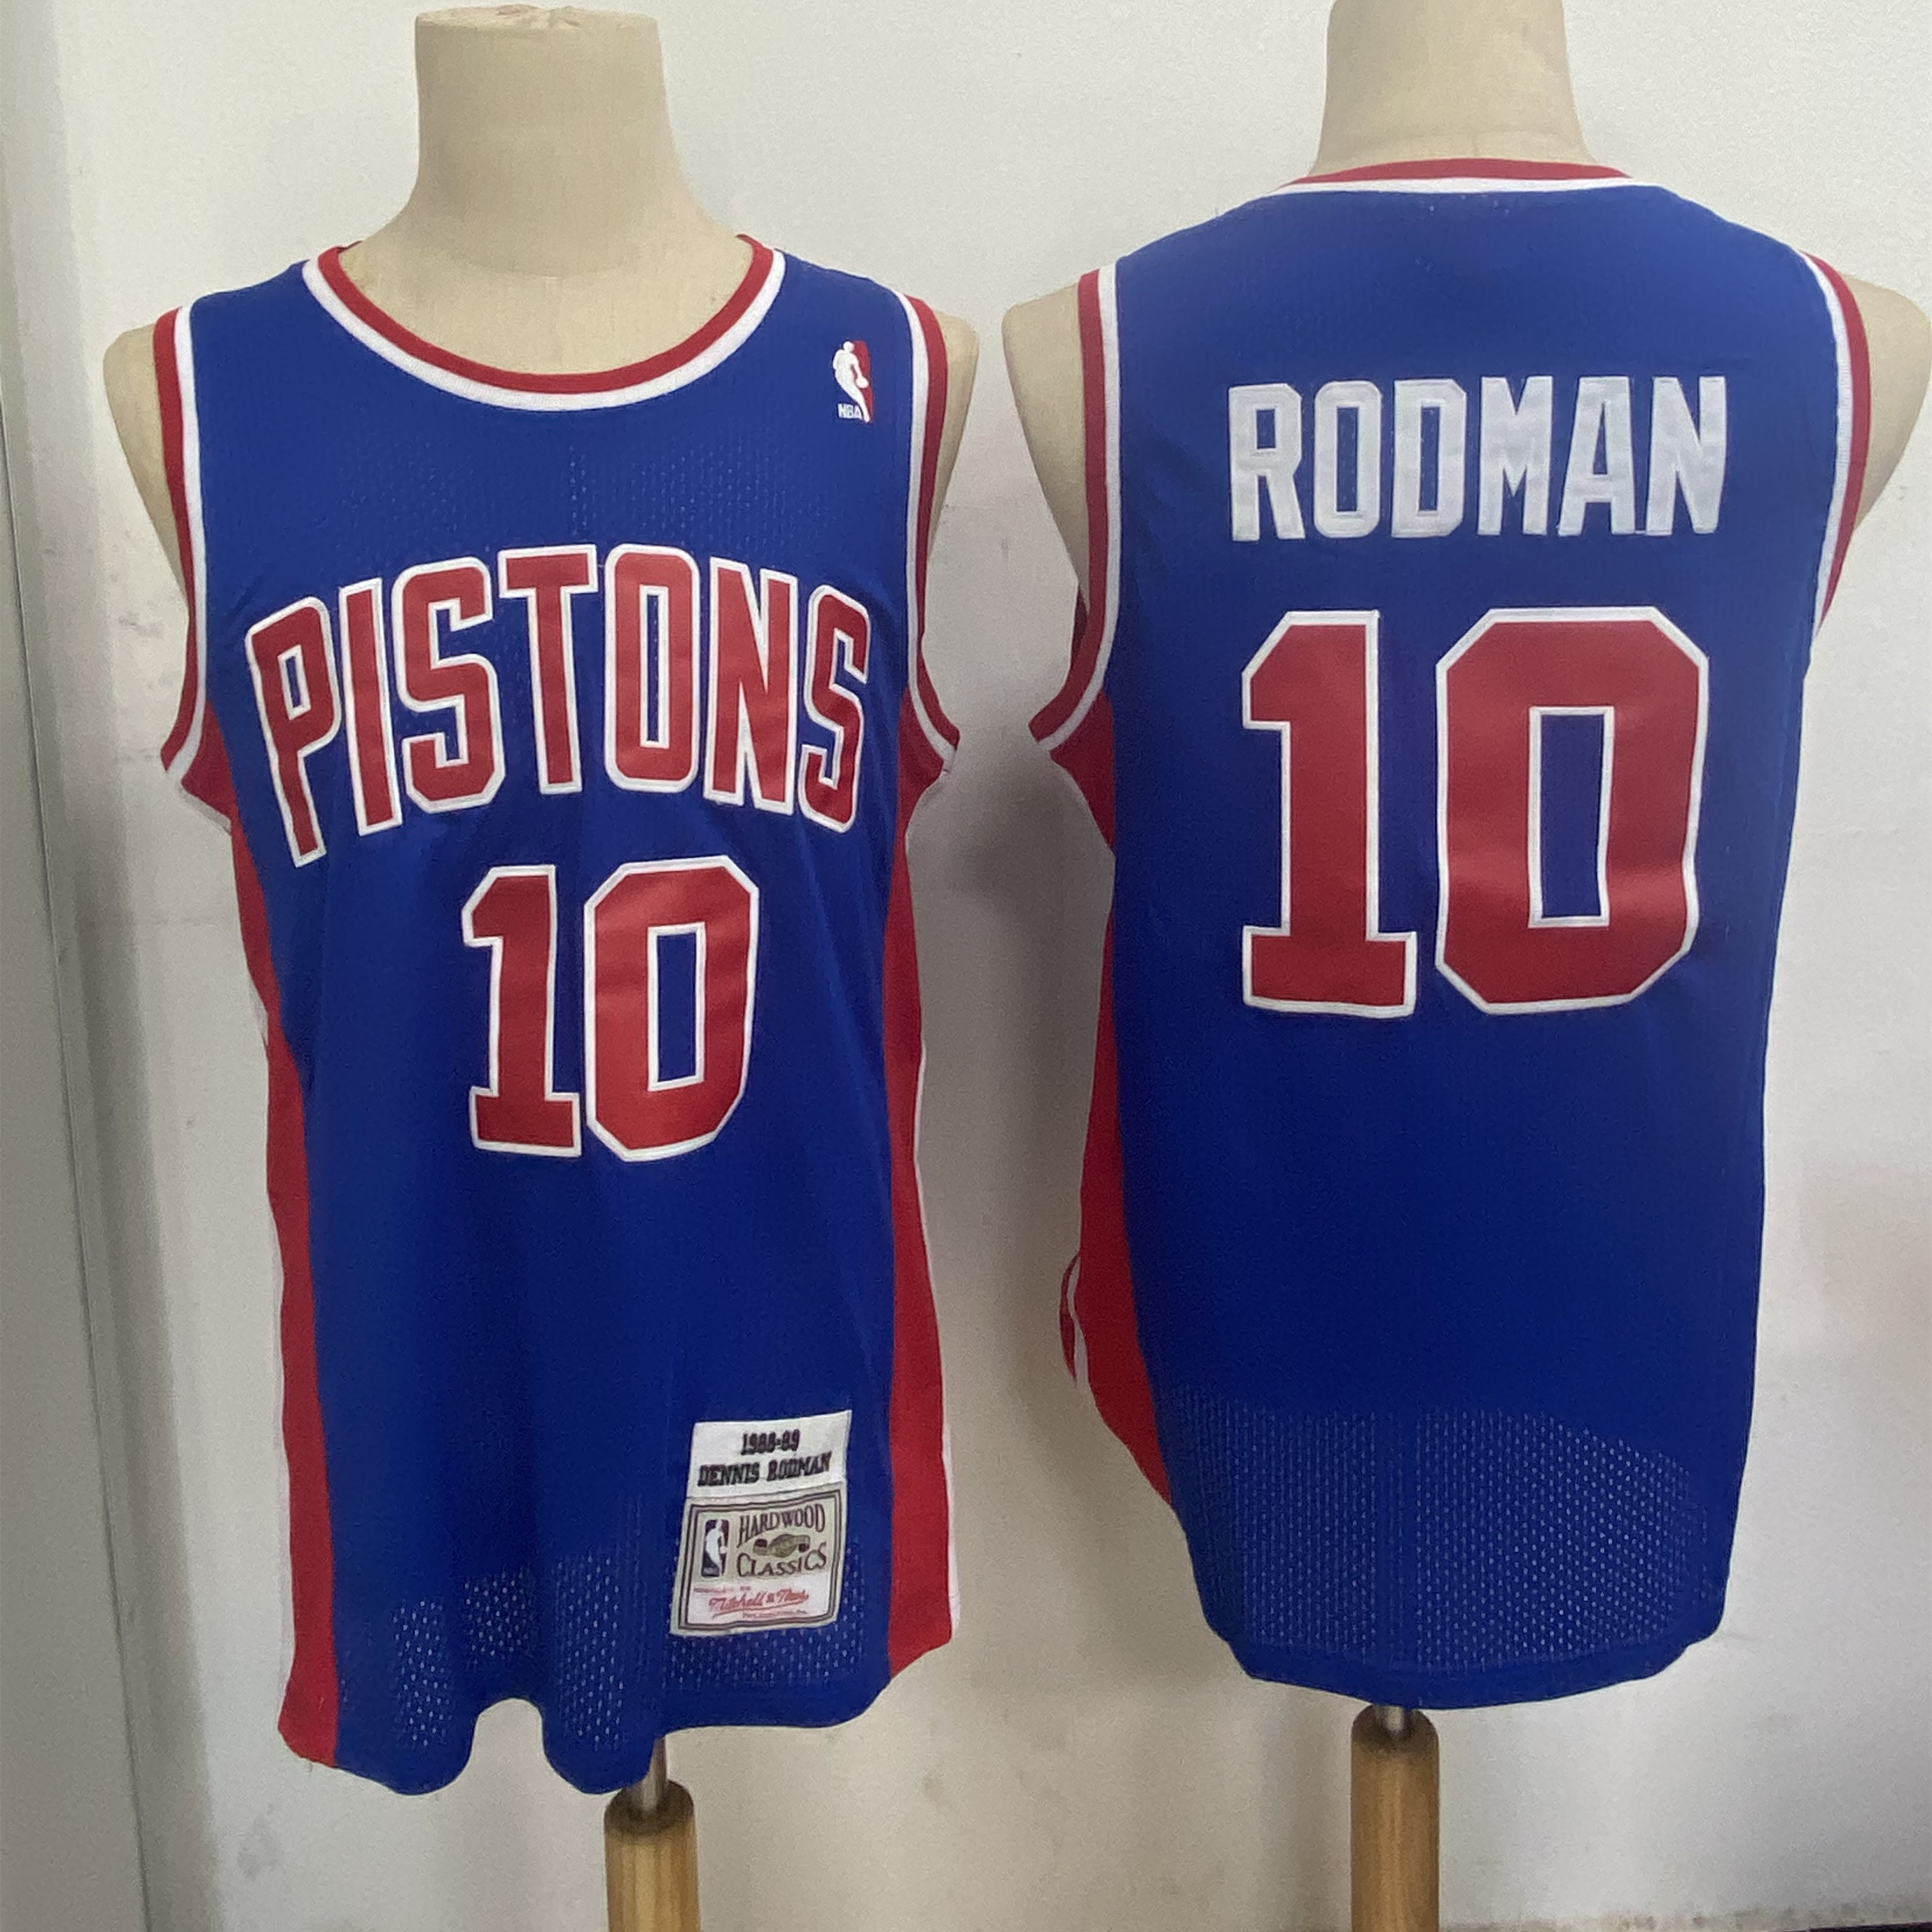 Pistons 10 Dennis Rodman Blue 1988-89 Hardwood Classics Jersey